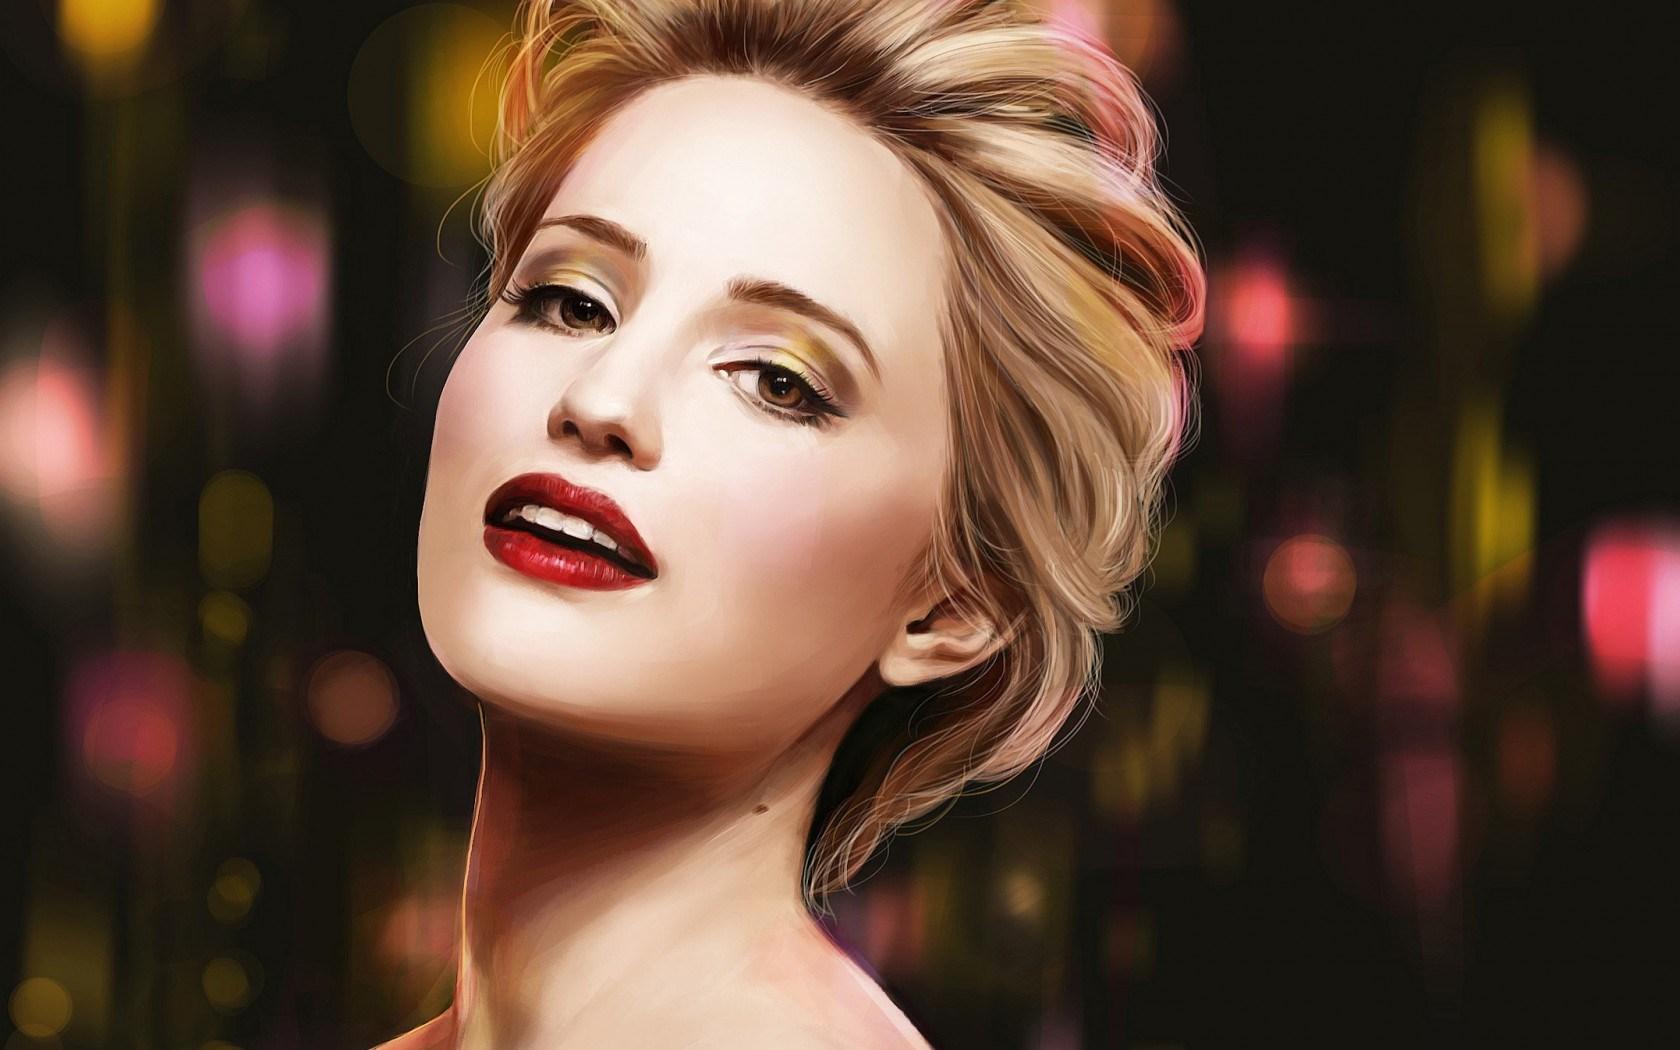 Dianna Agron Blonde Girl Actress Singer Artwork